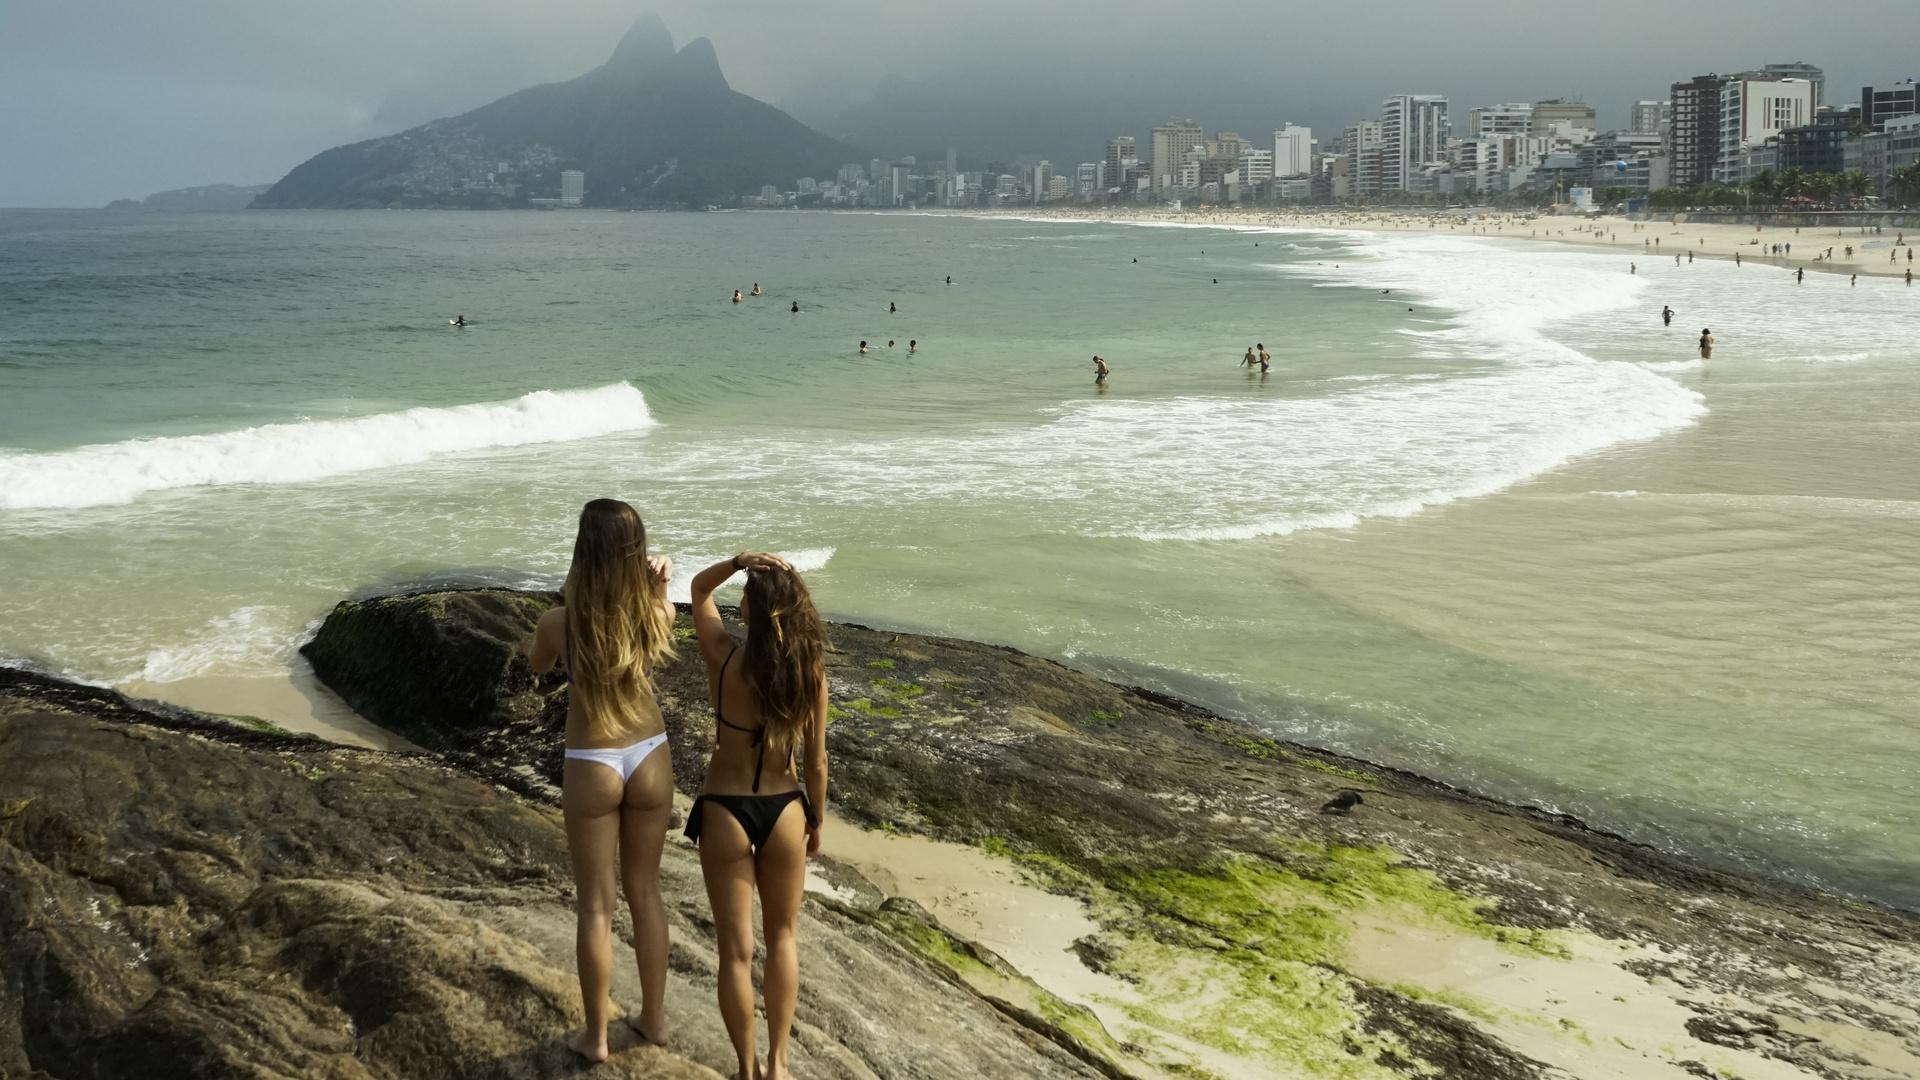 Strandschönheiten Foto & Bild | south america, brazil, rio